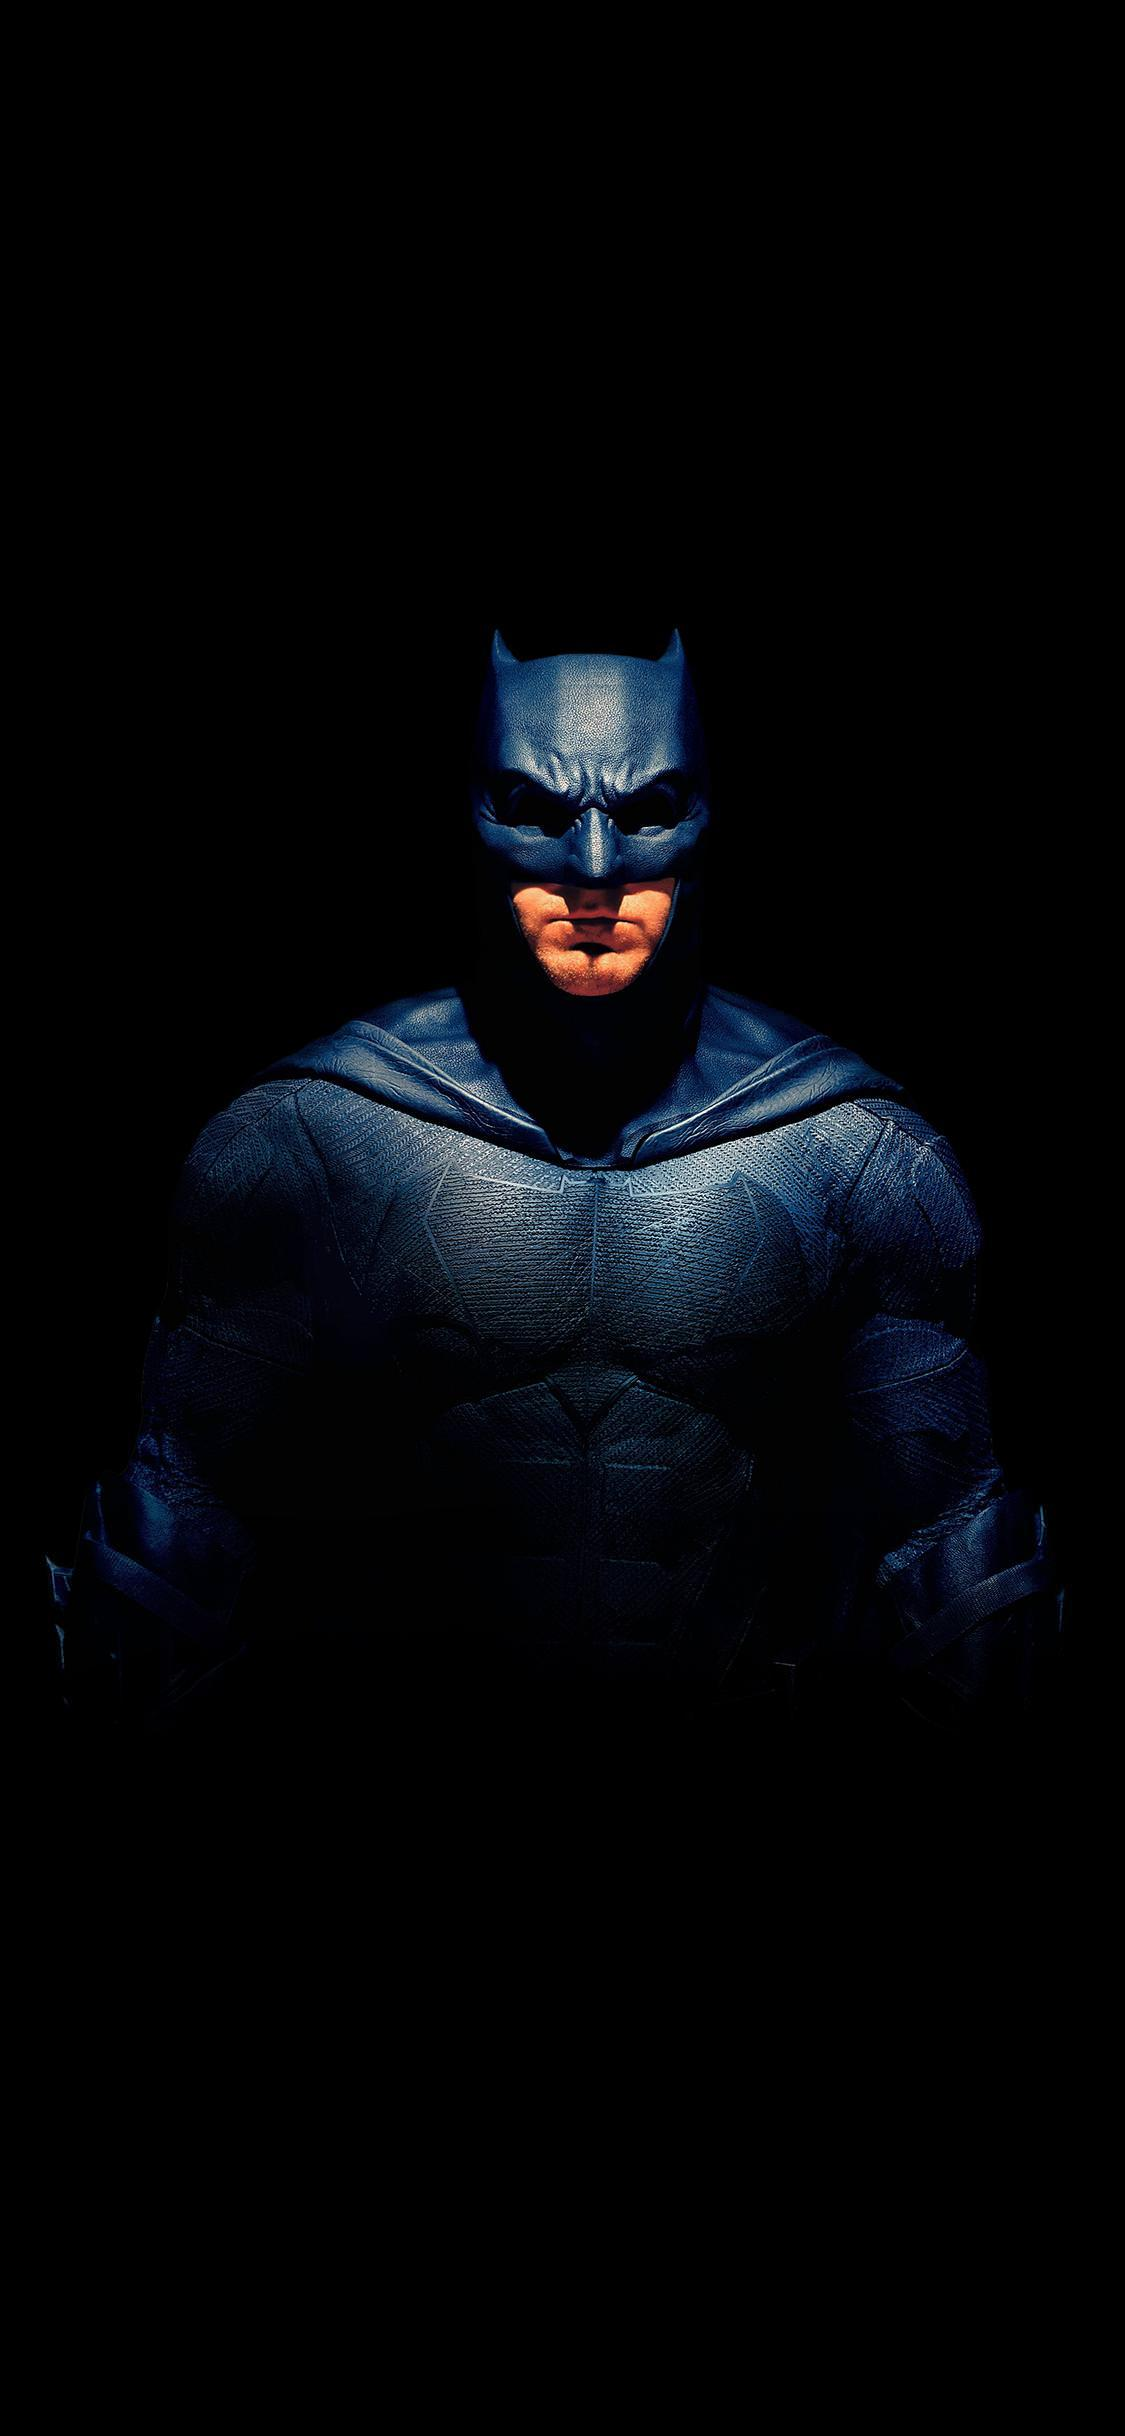 iPhone Batman Wallpapers - Wallpaper Cave